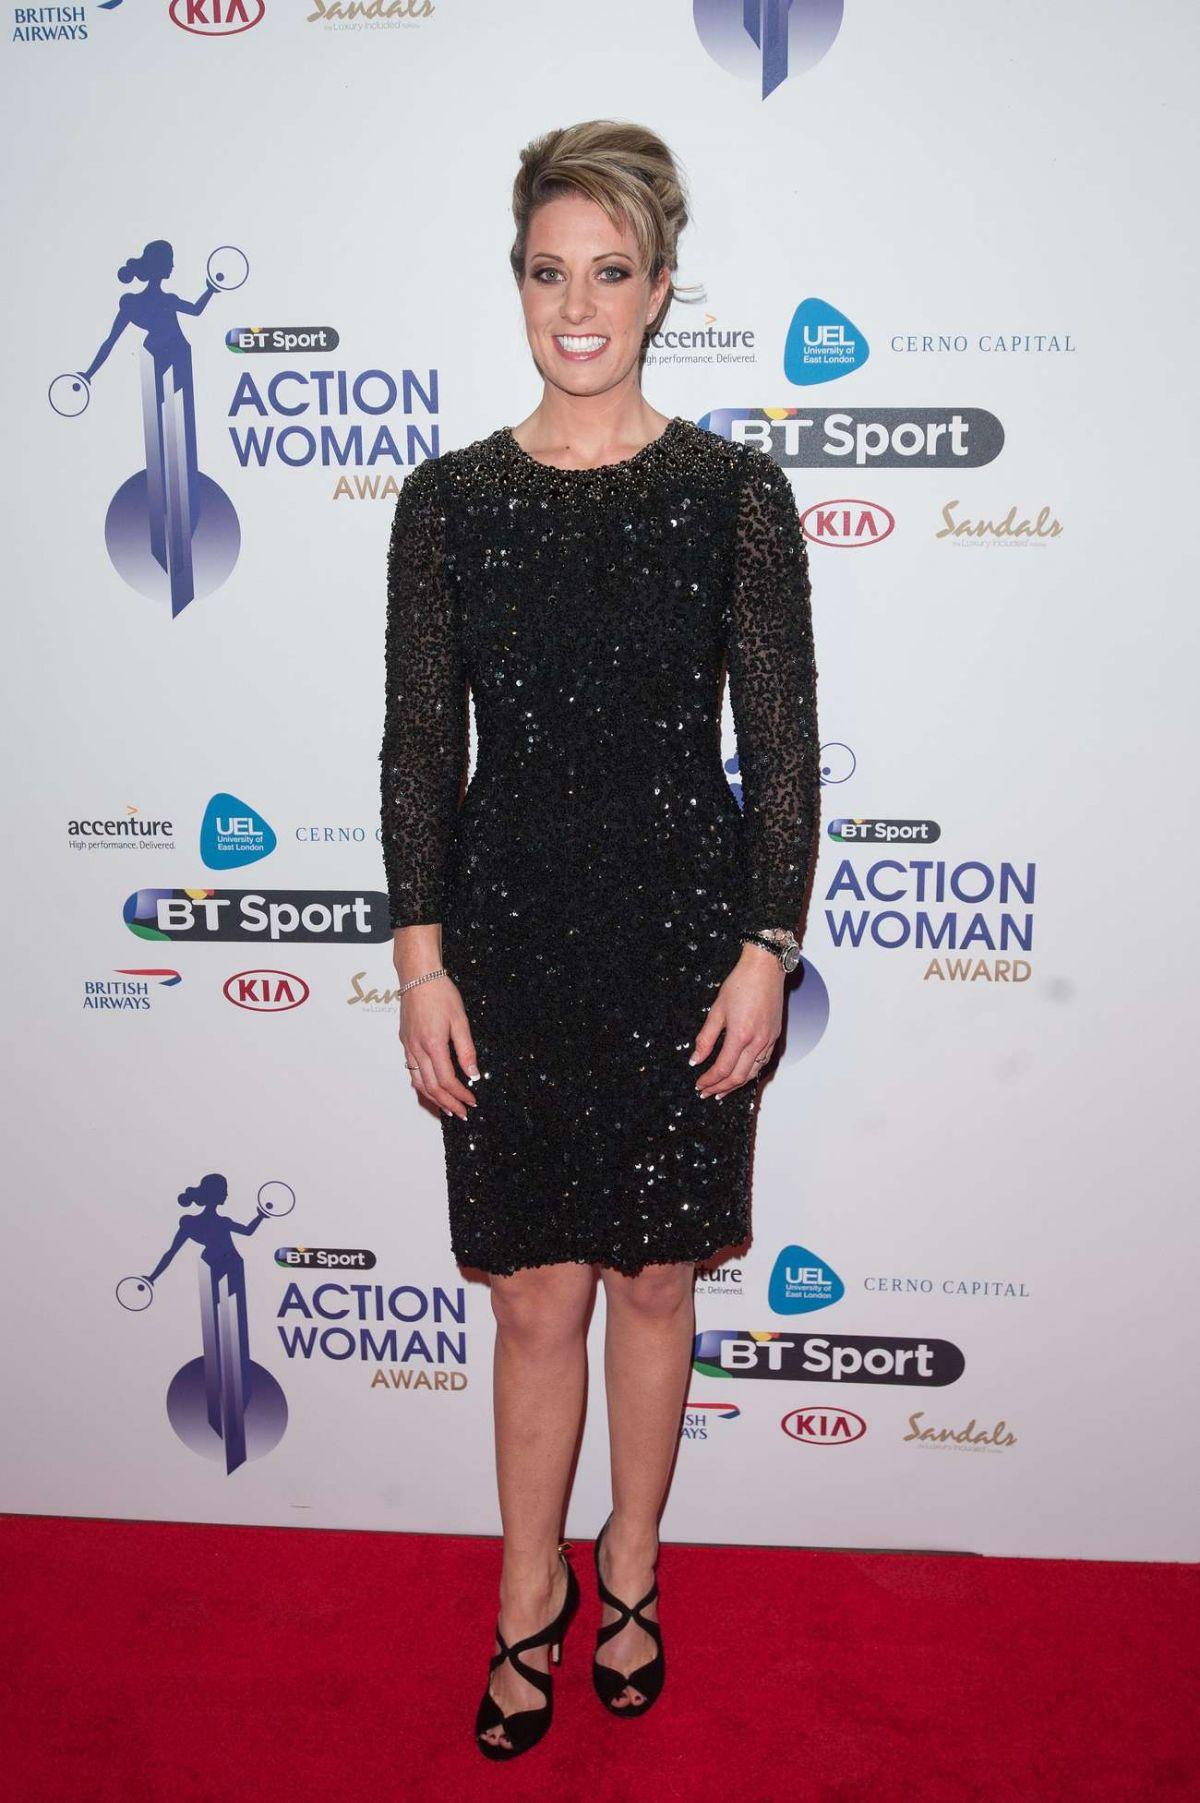 CHARLOTTE DUJARDIN at BT Sport Action Woman Awards